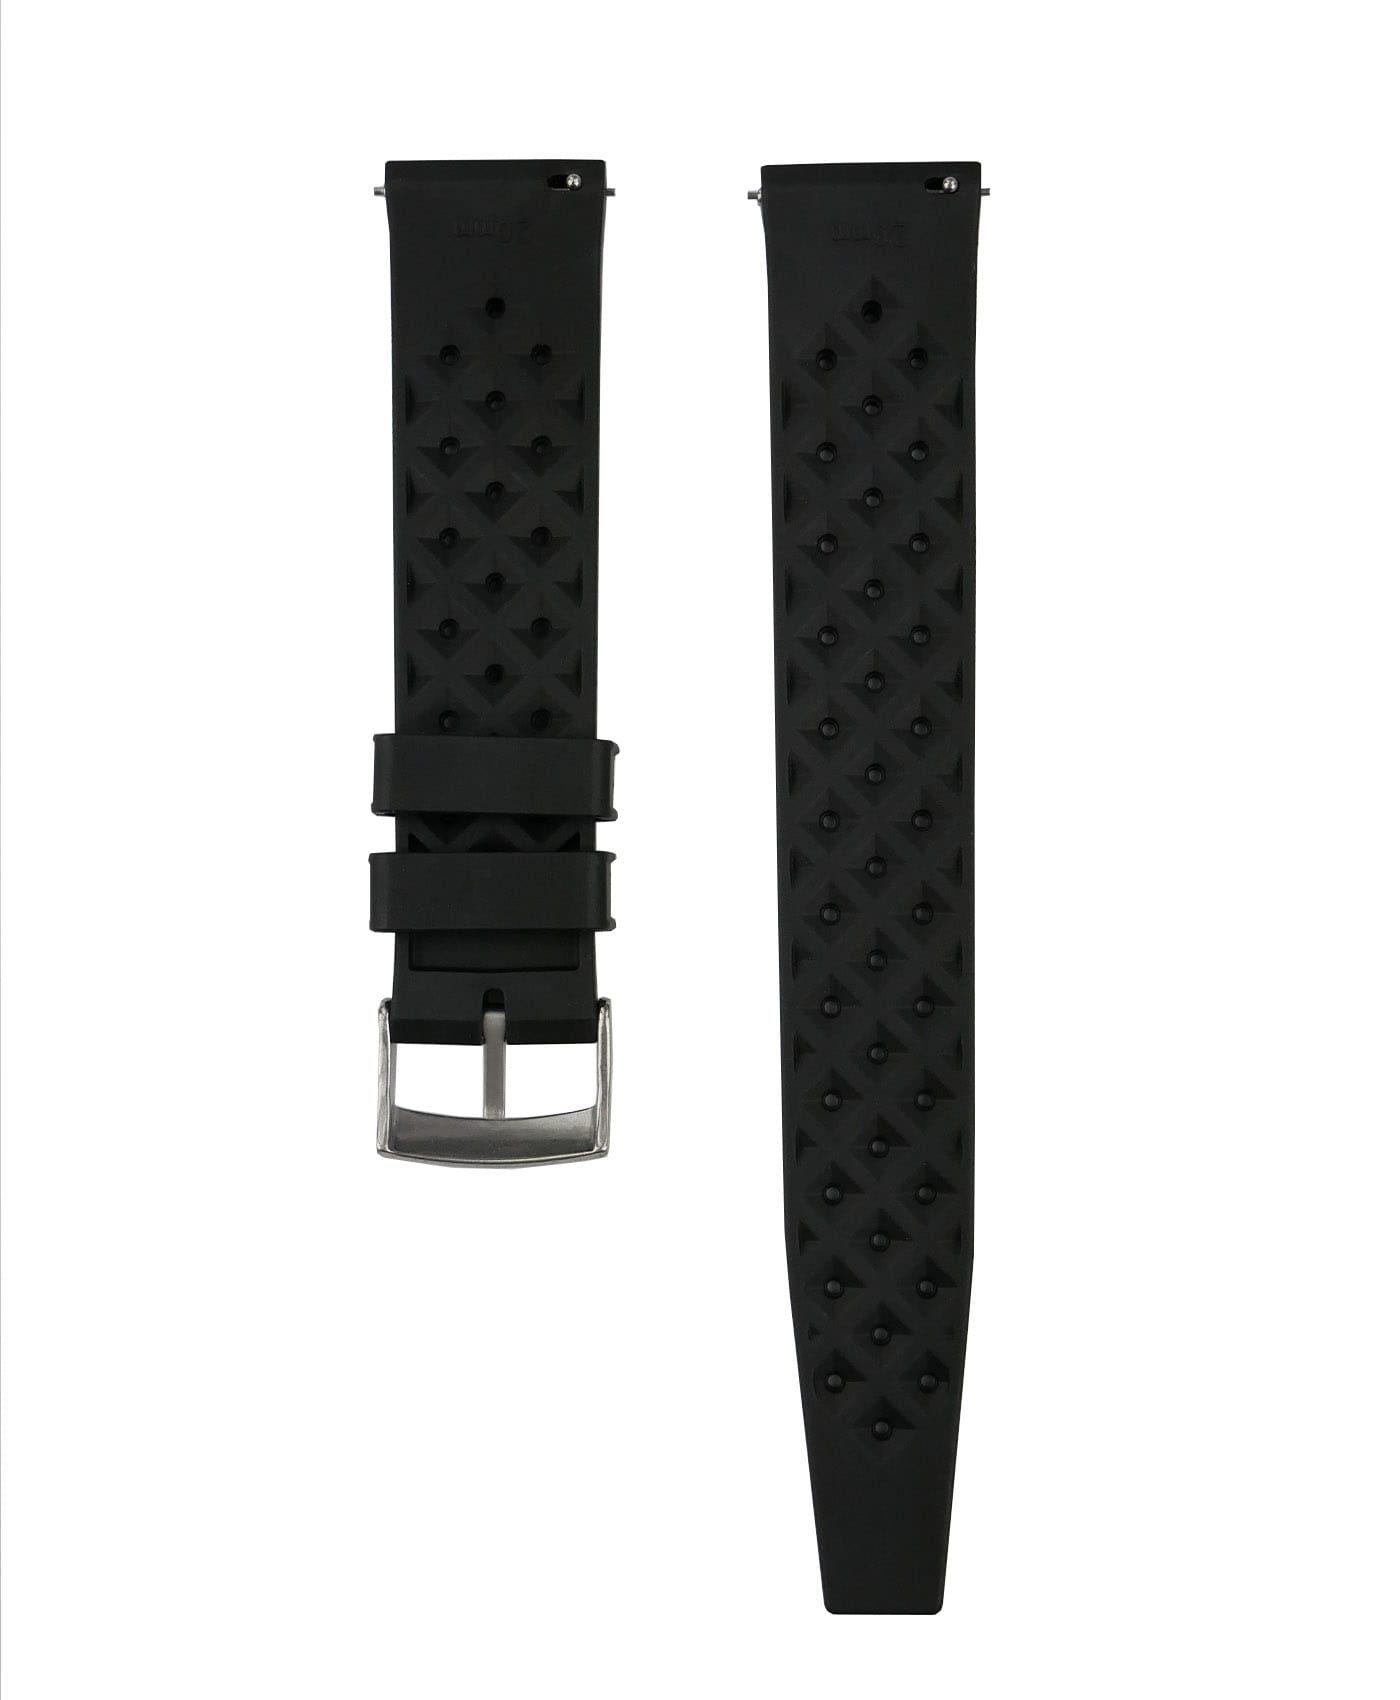 Tropical Rubber watch strap_Black_Back